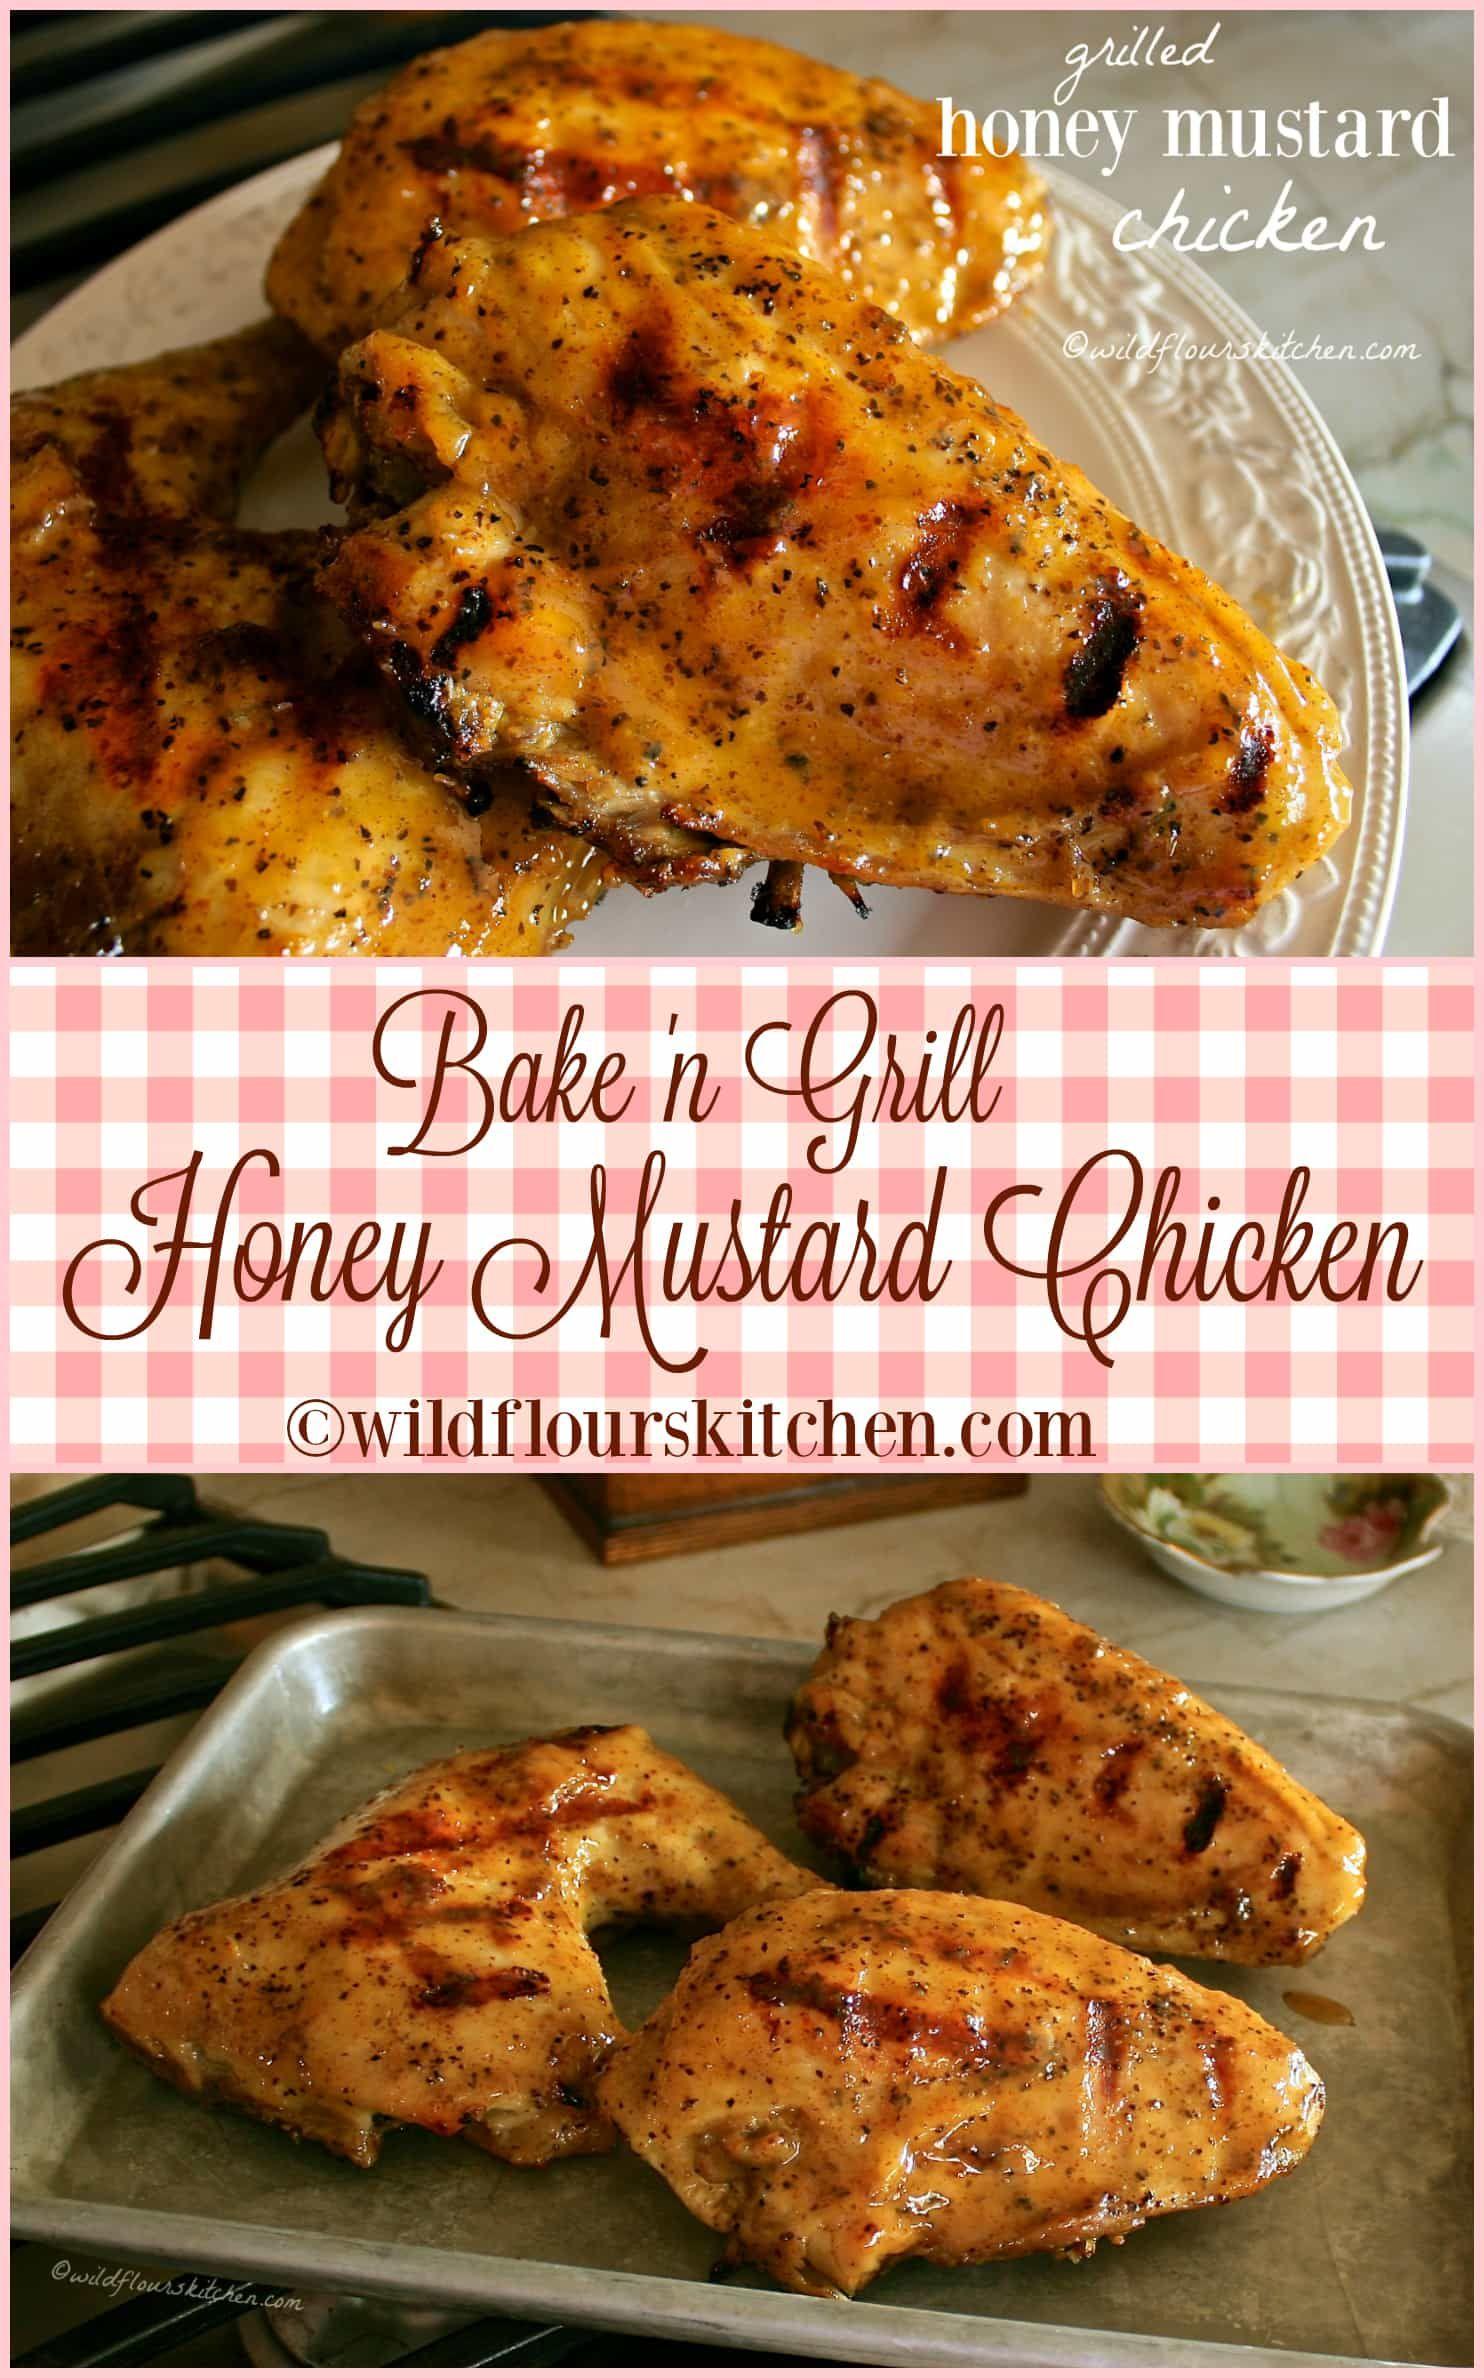 Bake n grill honey mustard chicken recette a table